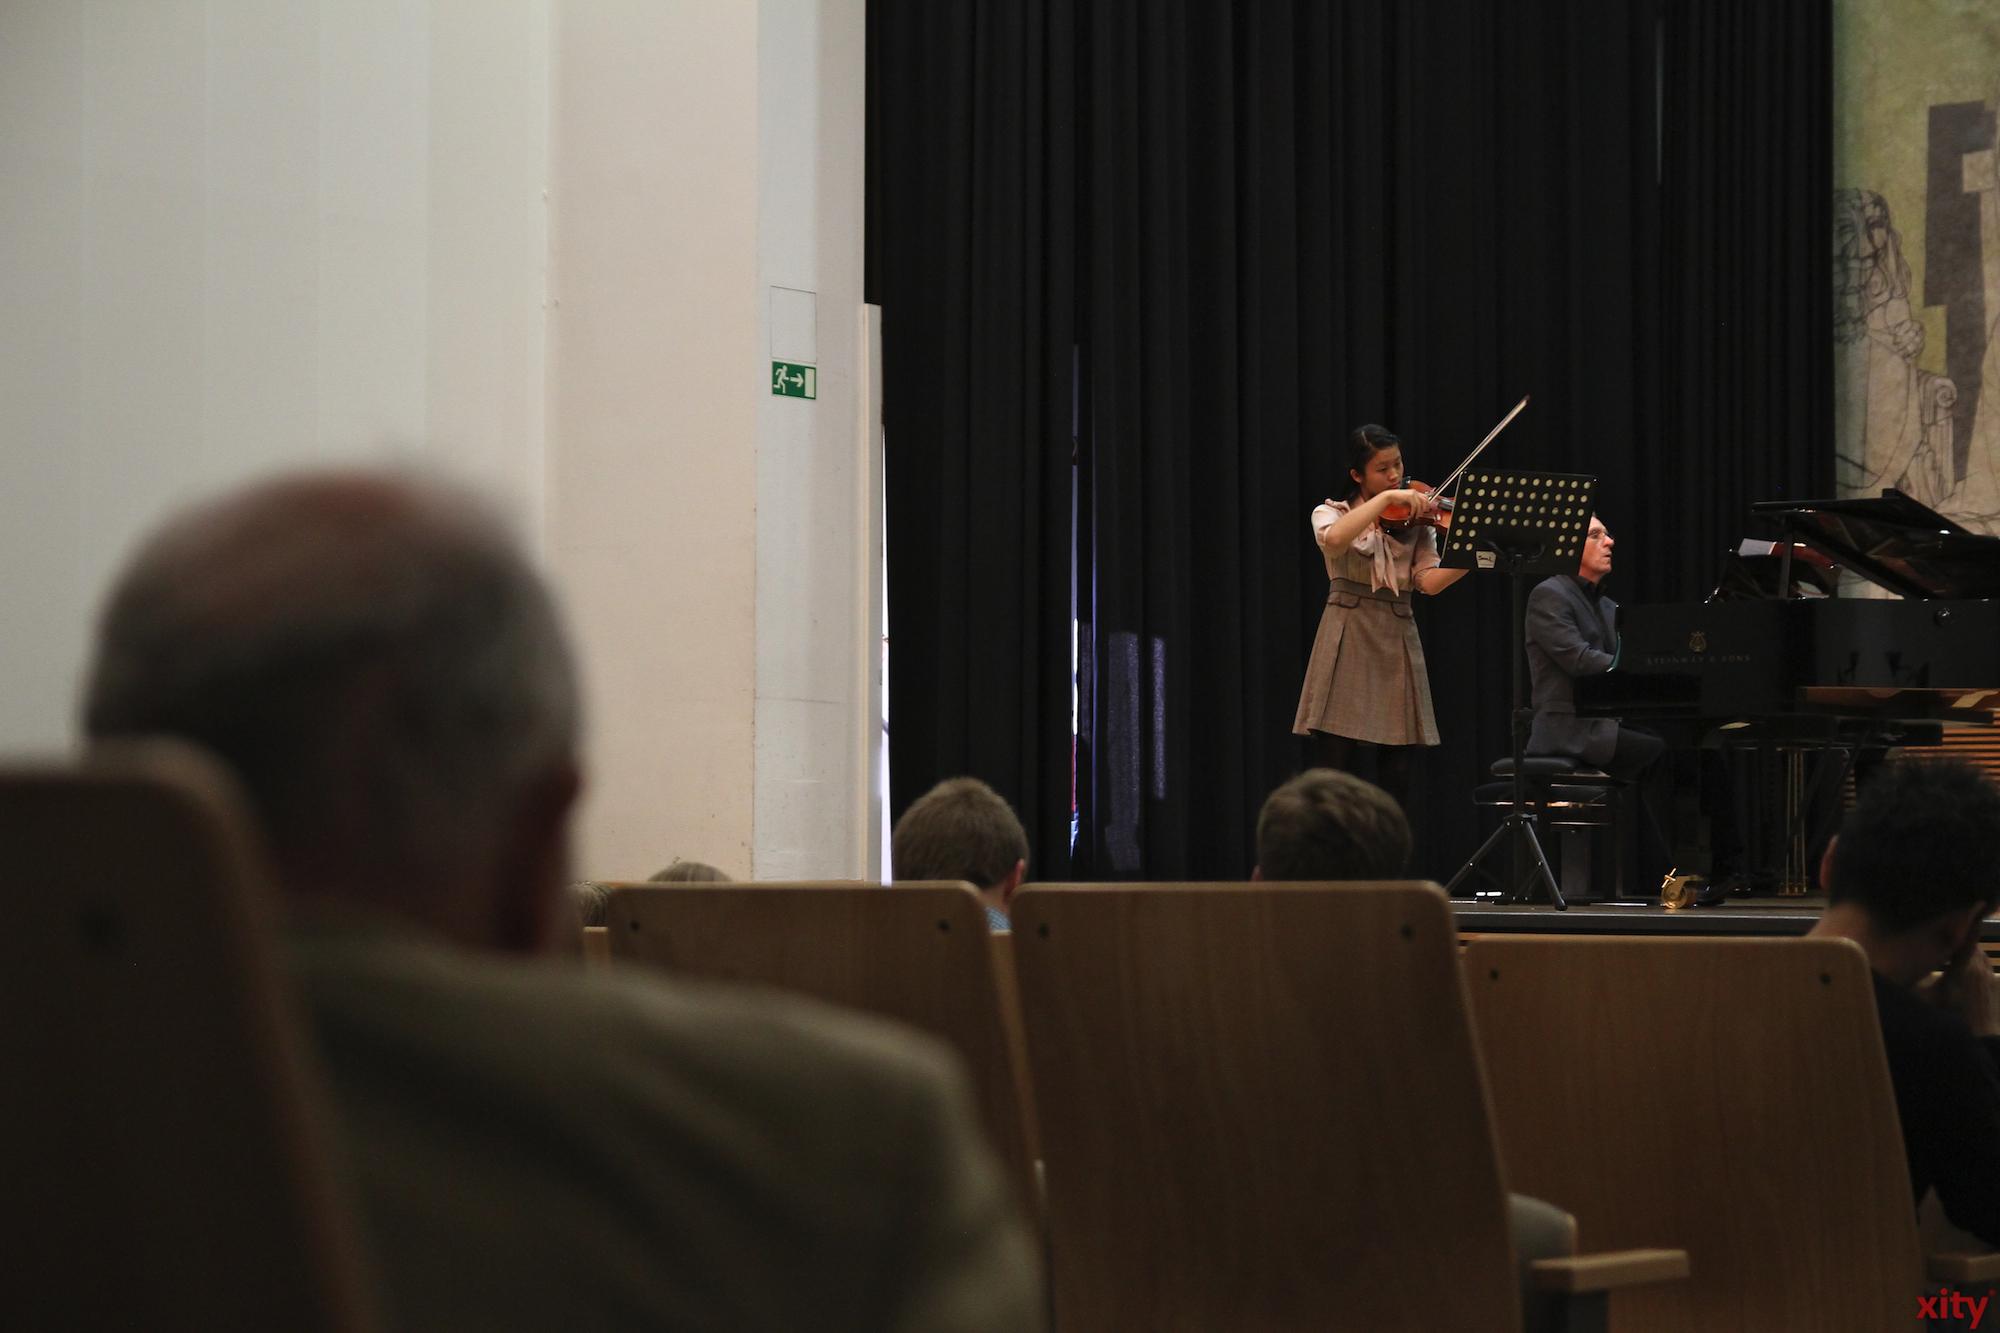 Die Kawai-Klavierkonzerte in Krefeld feiern ihr 25-jähriges Bestehen (Foto: xity)